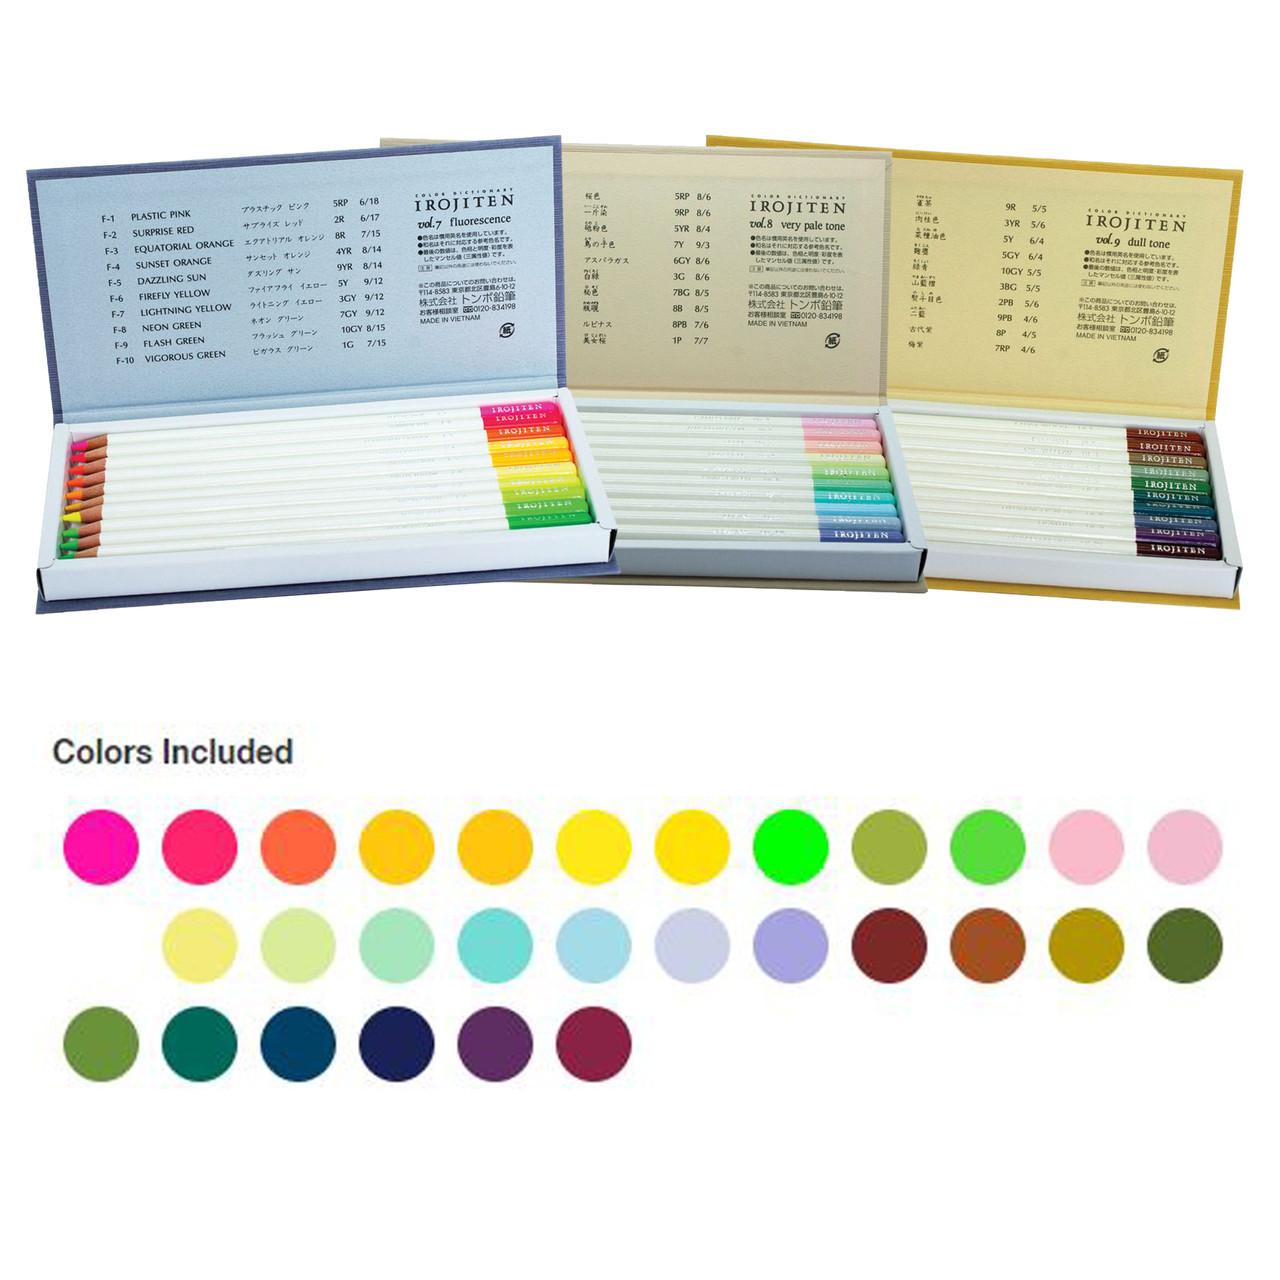 Irojiten Pencil 30-color Seascape Set